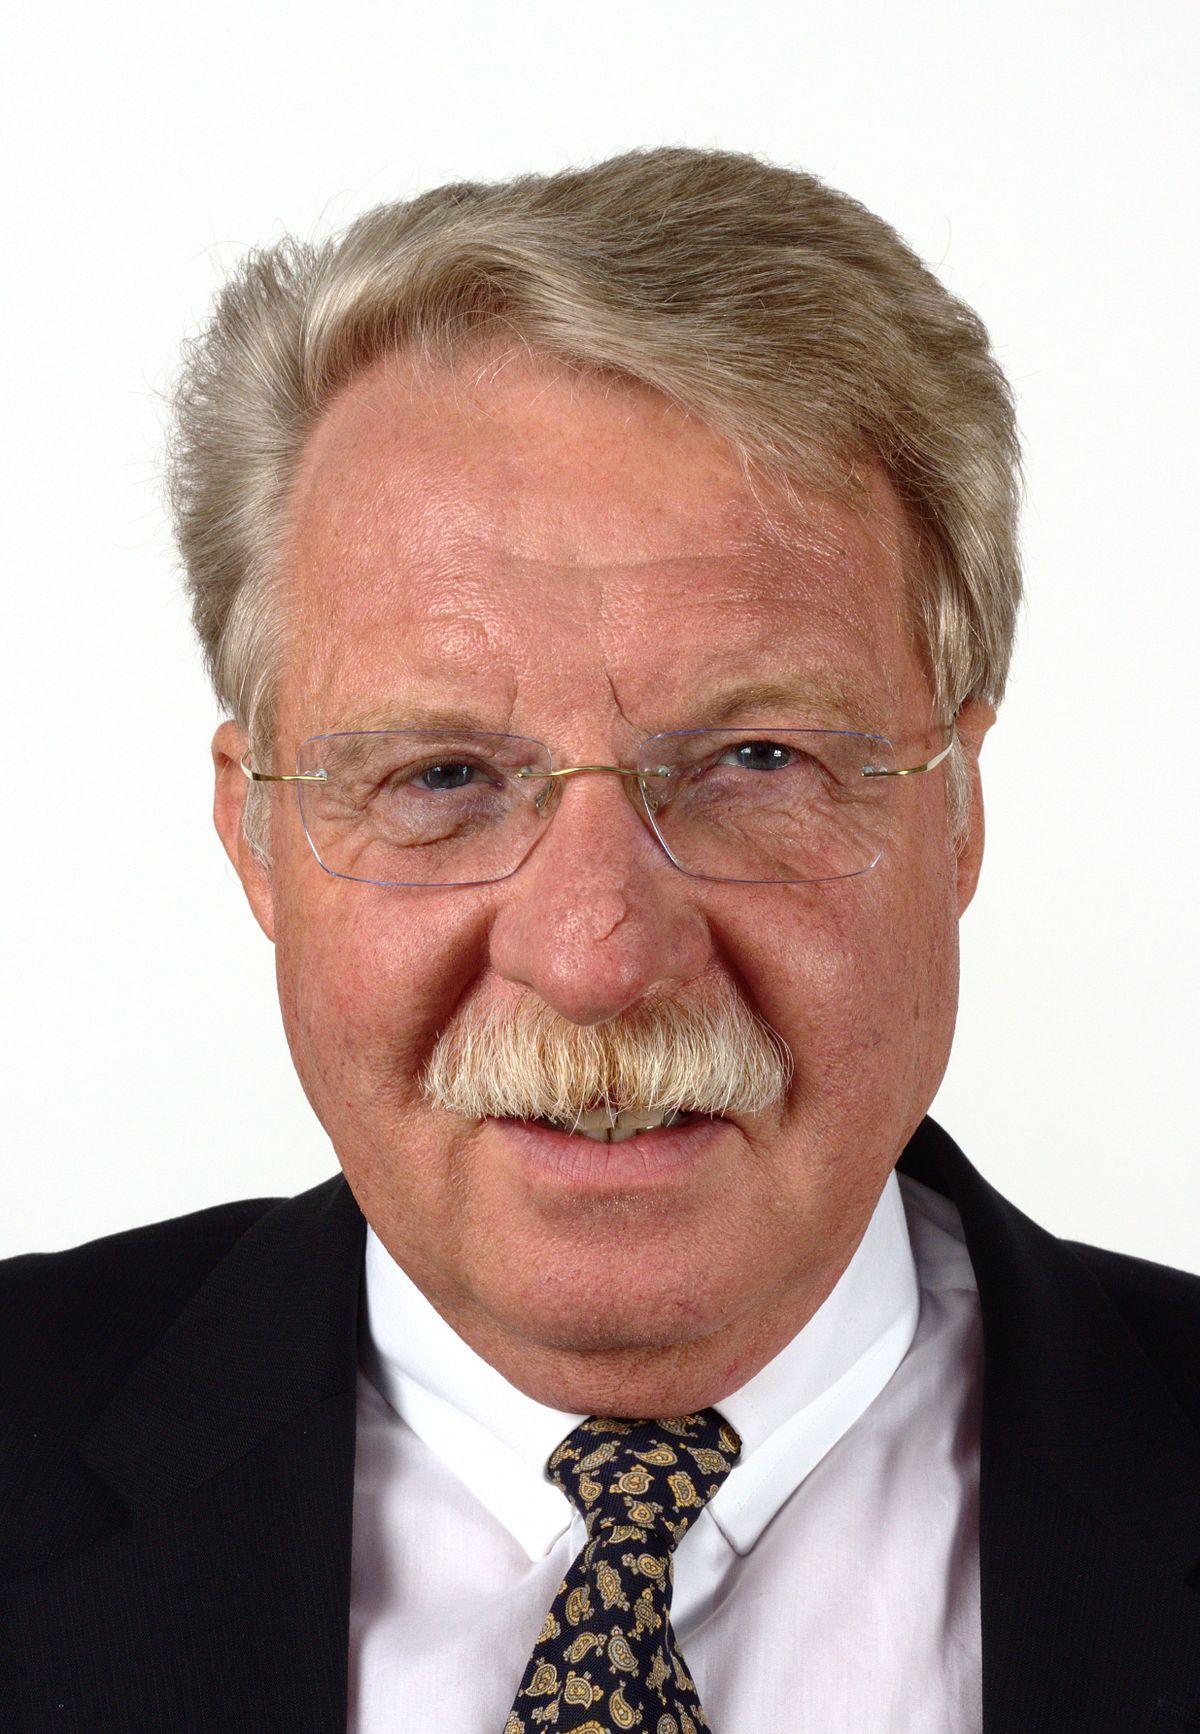 Otmar bernhard wikipedia for Spiegel wiki